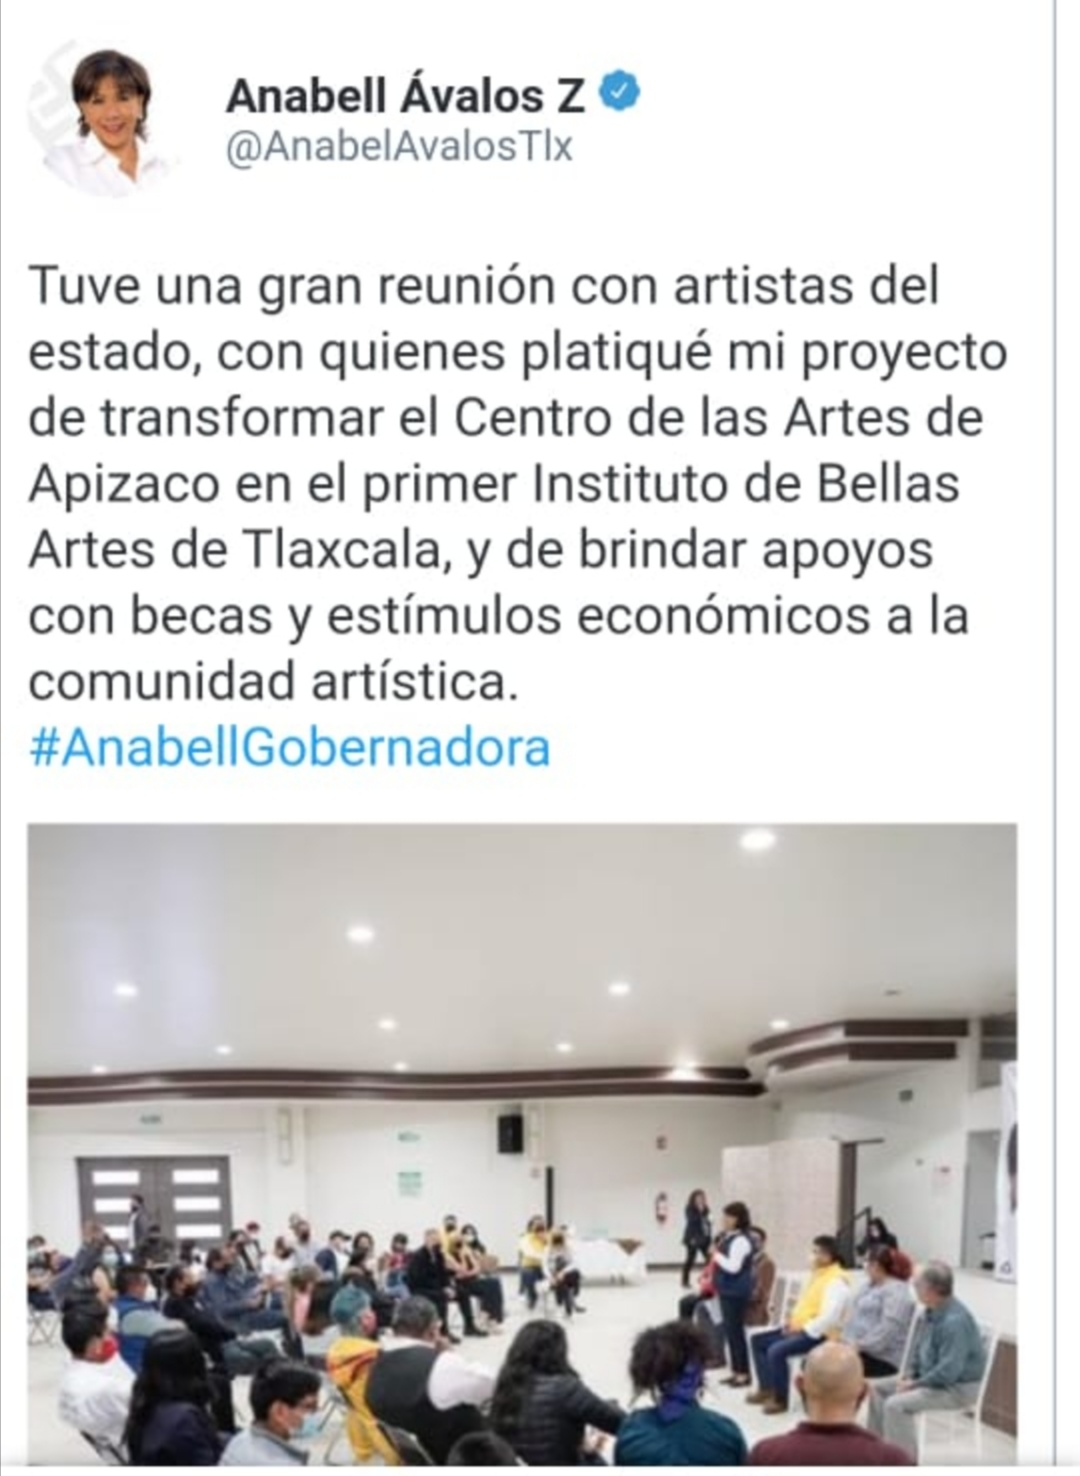 Anabell Ávalos Zempoalteca se reúne con artistas del Estado